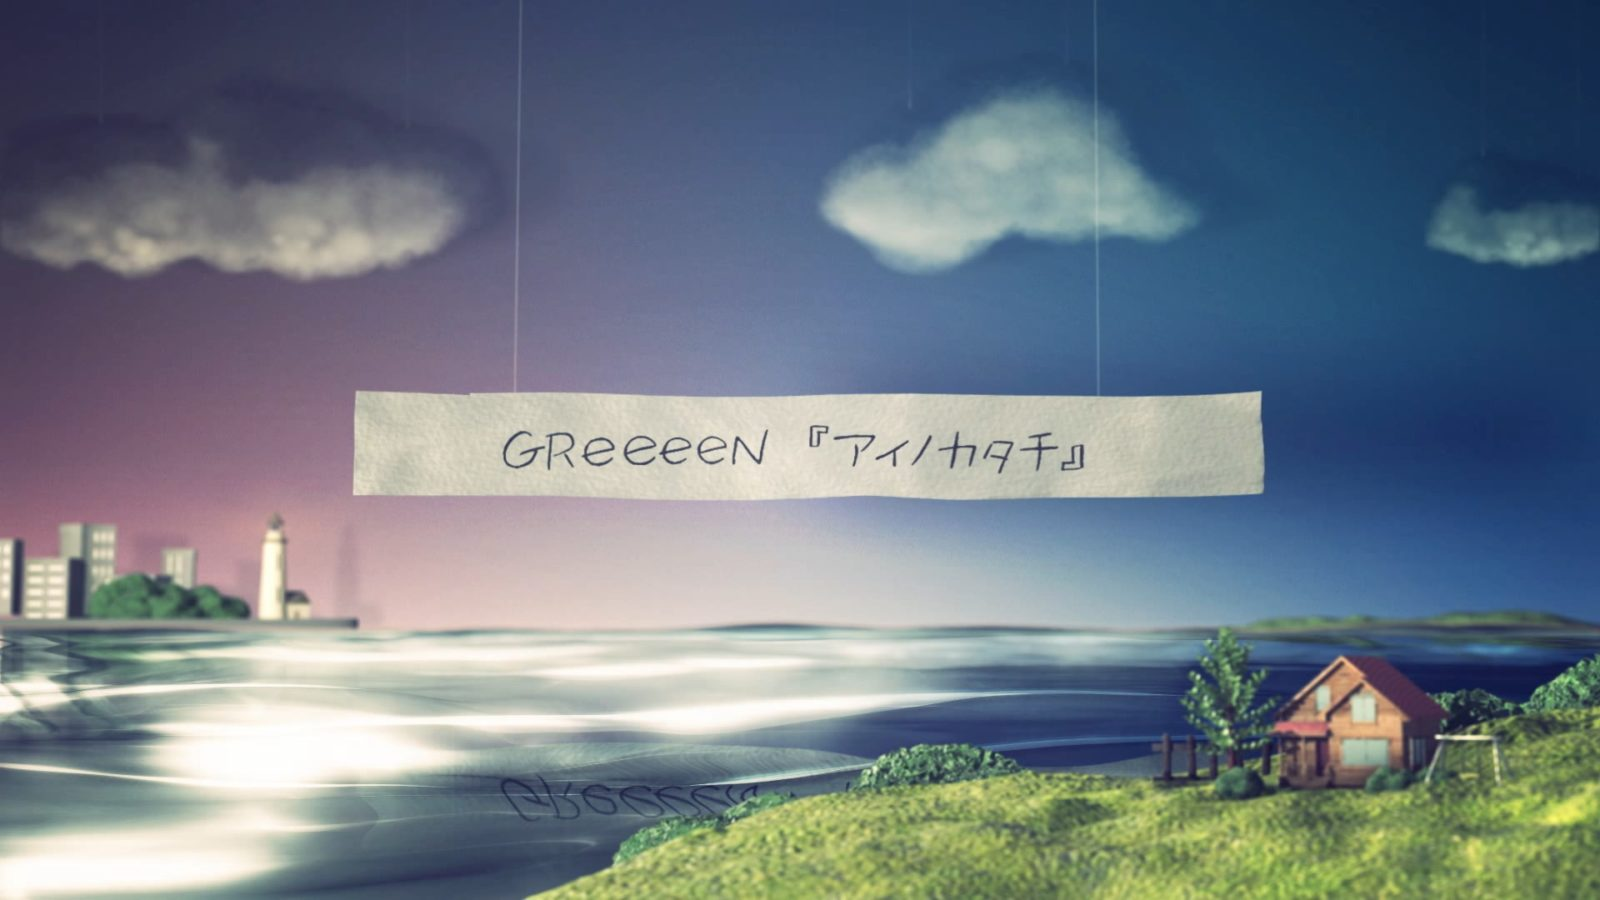 GReeeeNセルフカバーに感動の声が続々! 「アイノカタチ」ミュージックビデオ急遽公開サムネイル画像